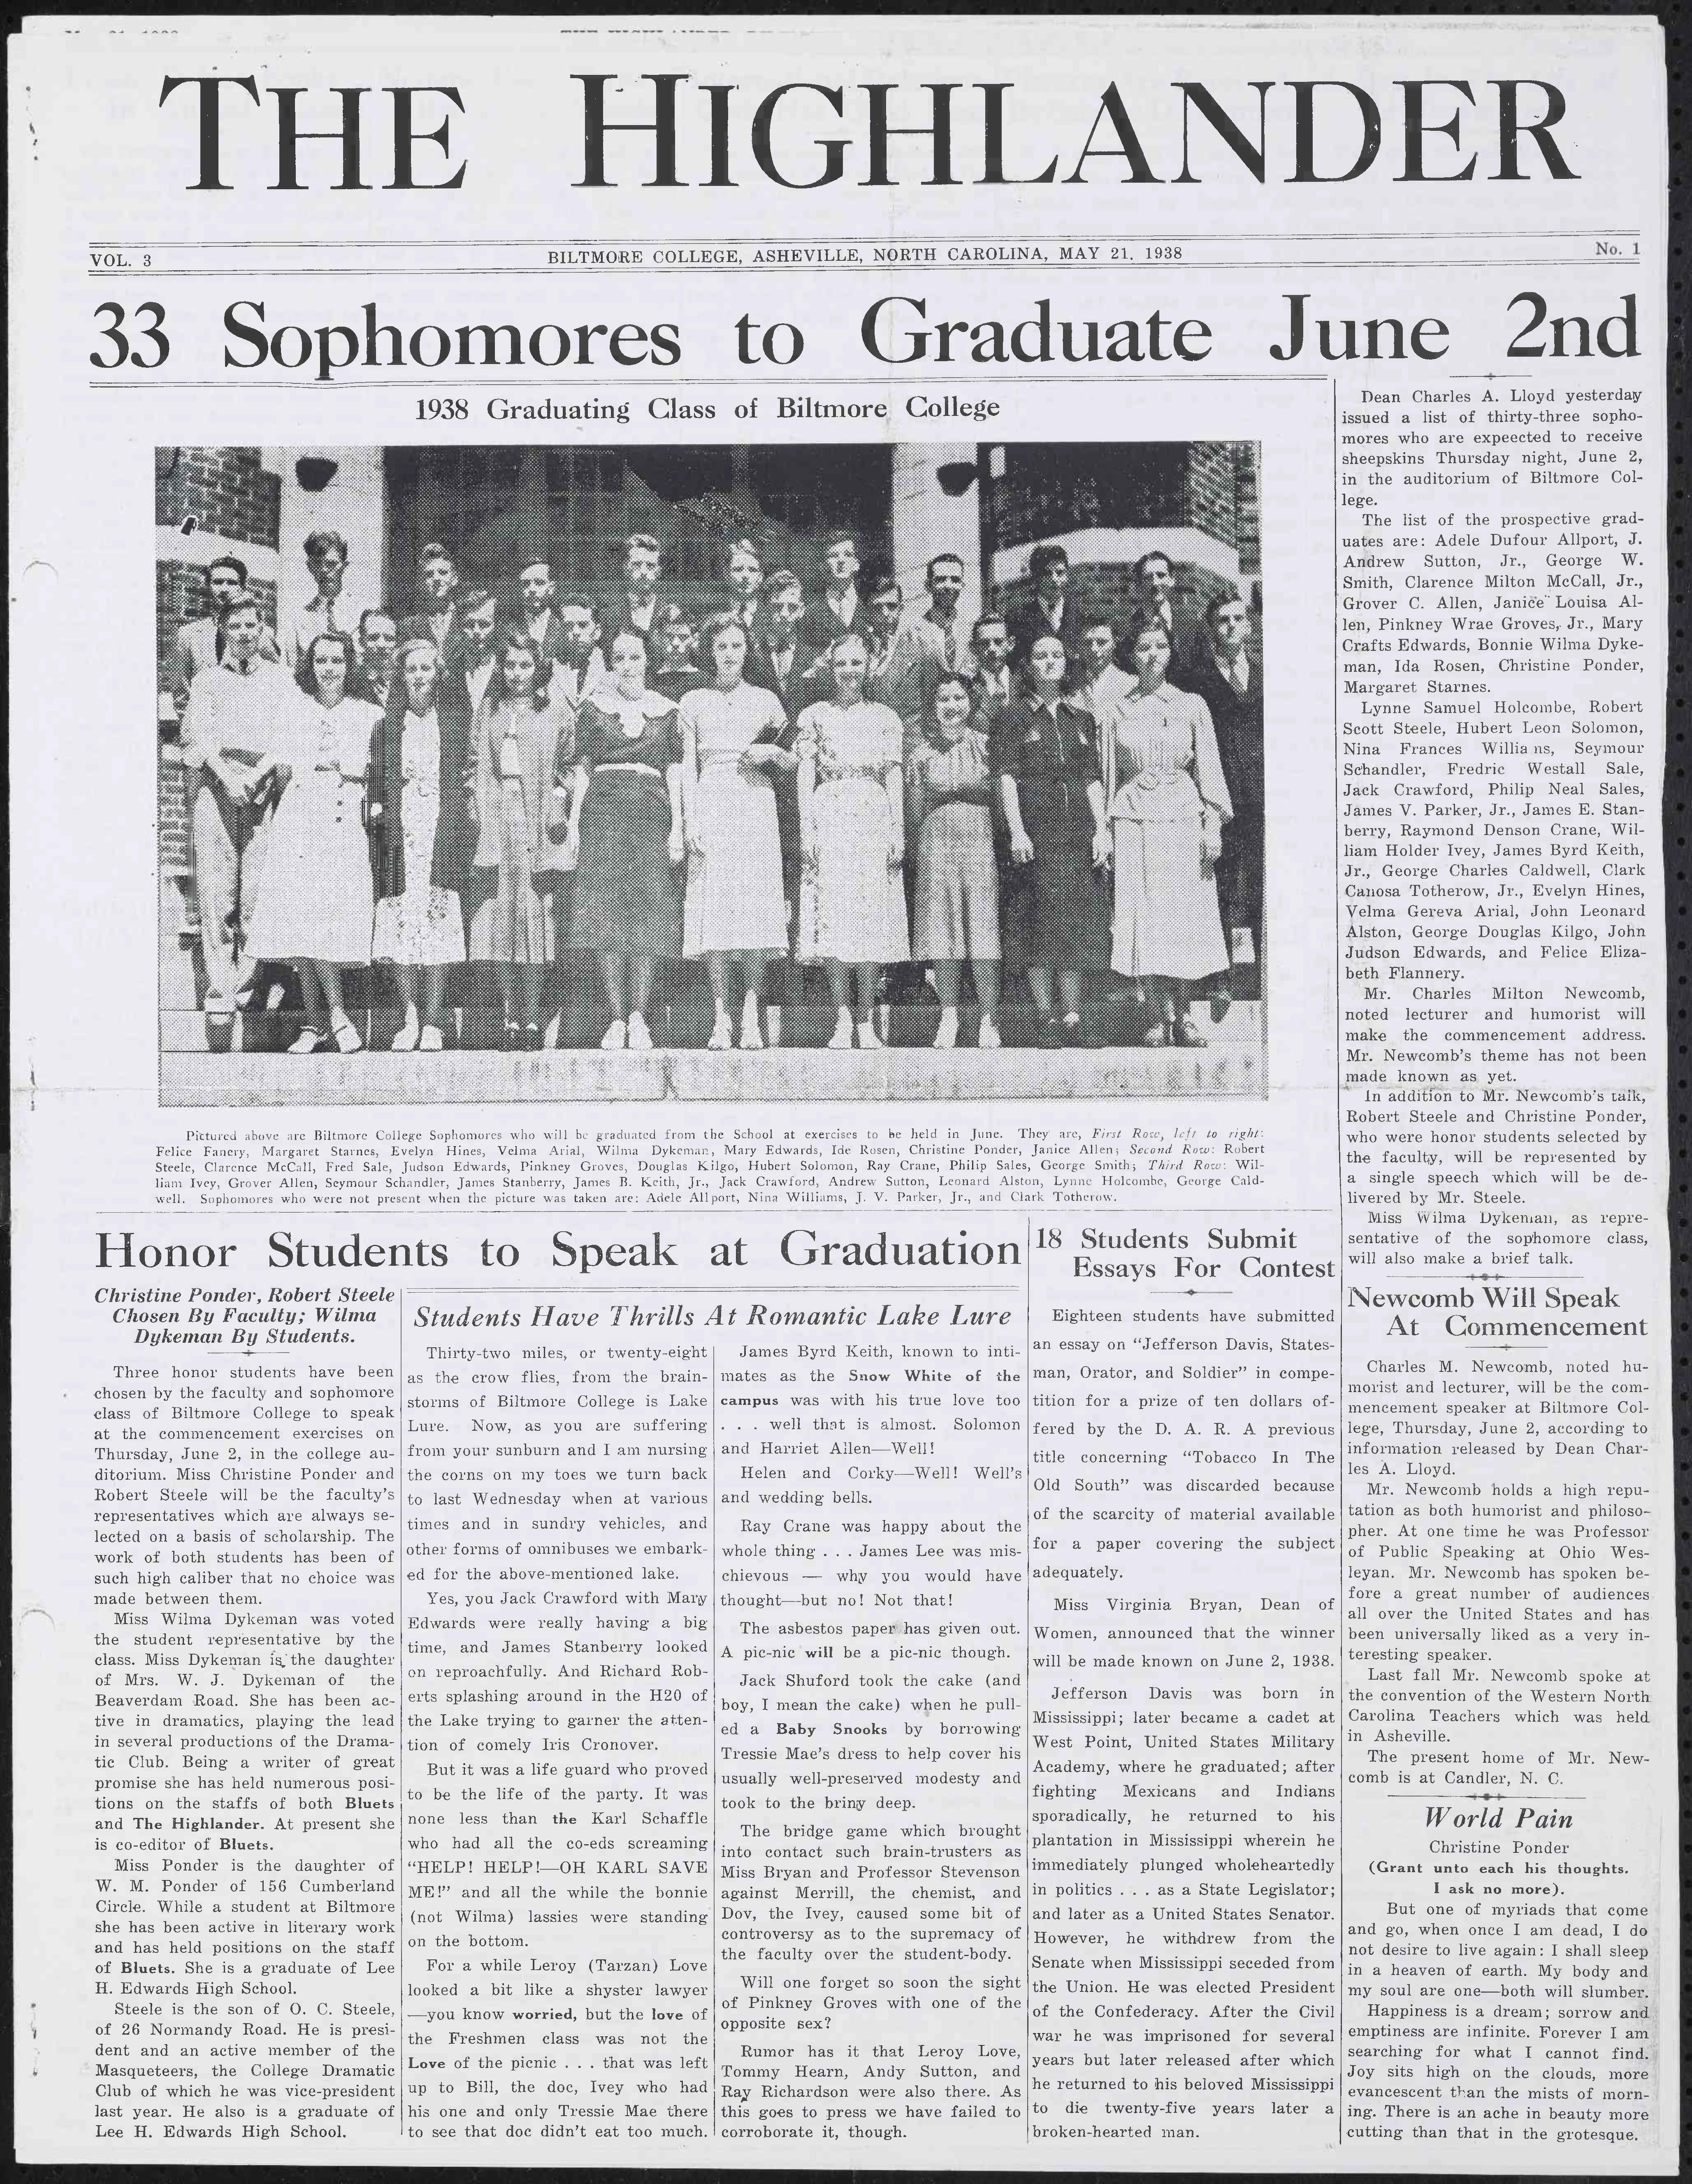 1938 paper